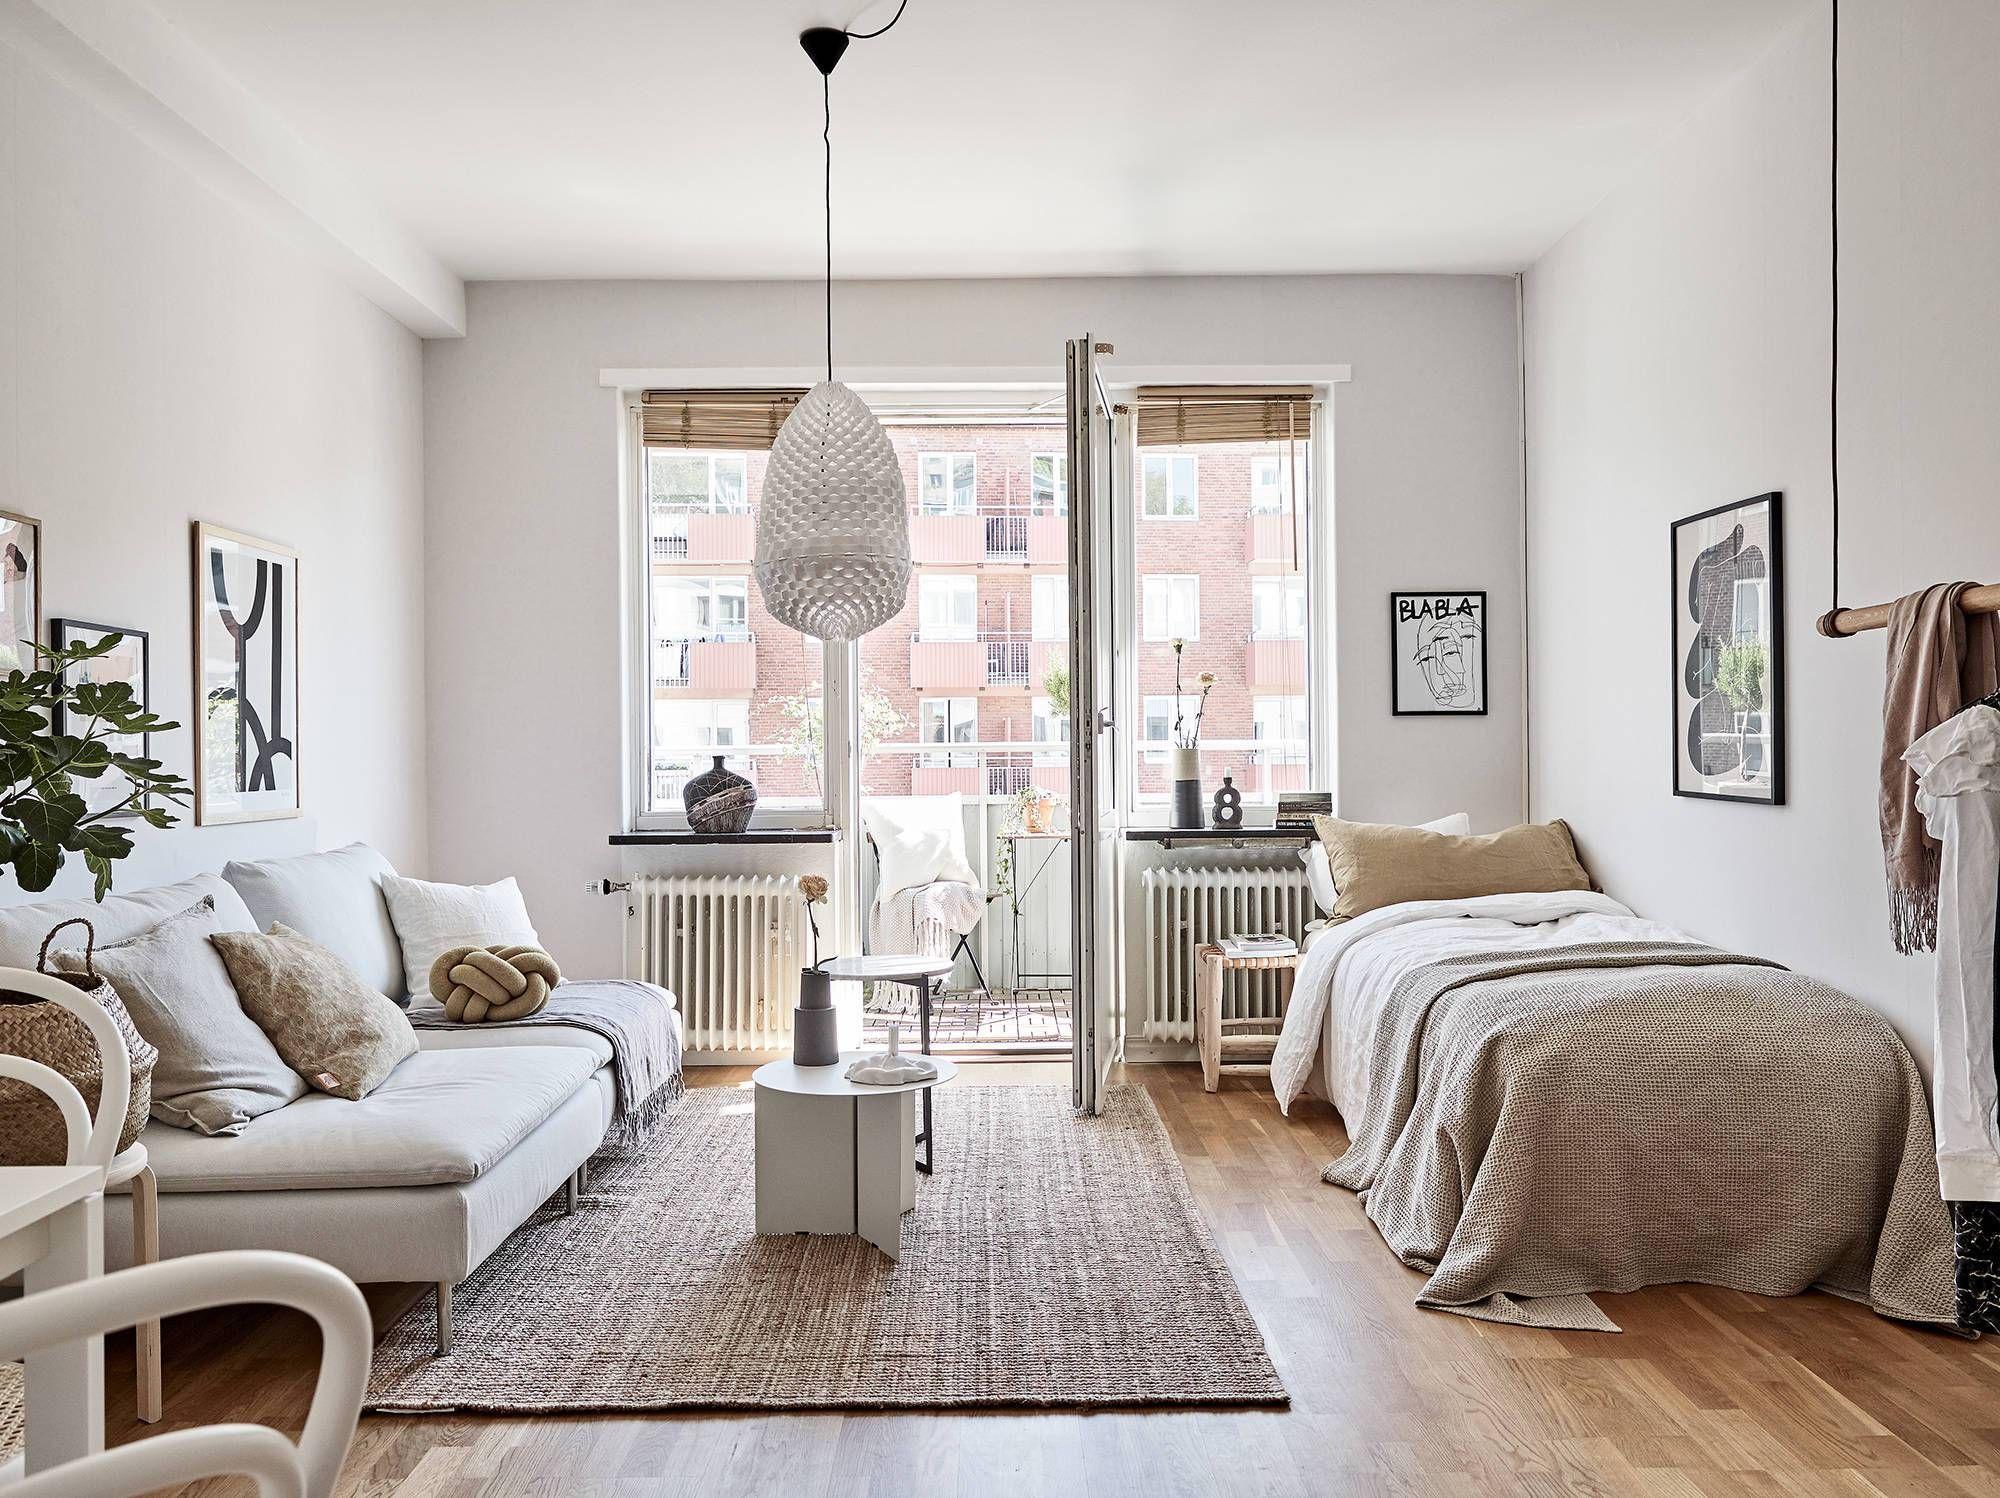 Small Studio Space In A Warm Color Palette Apartment Interior